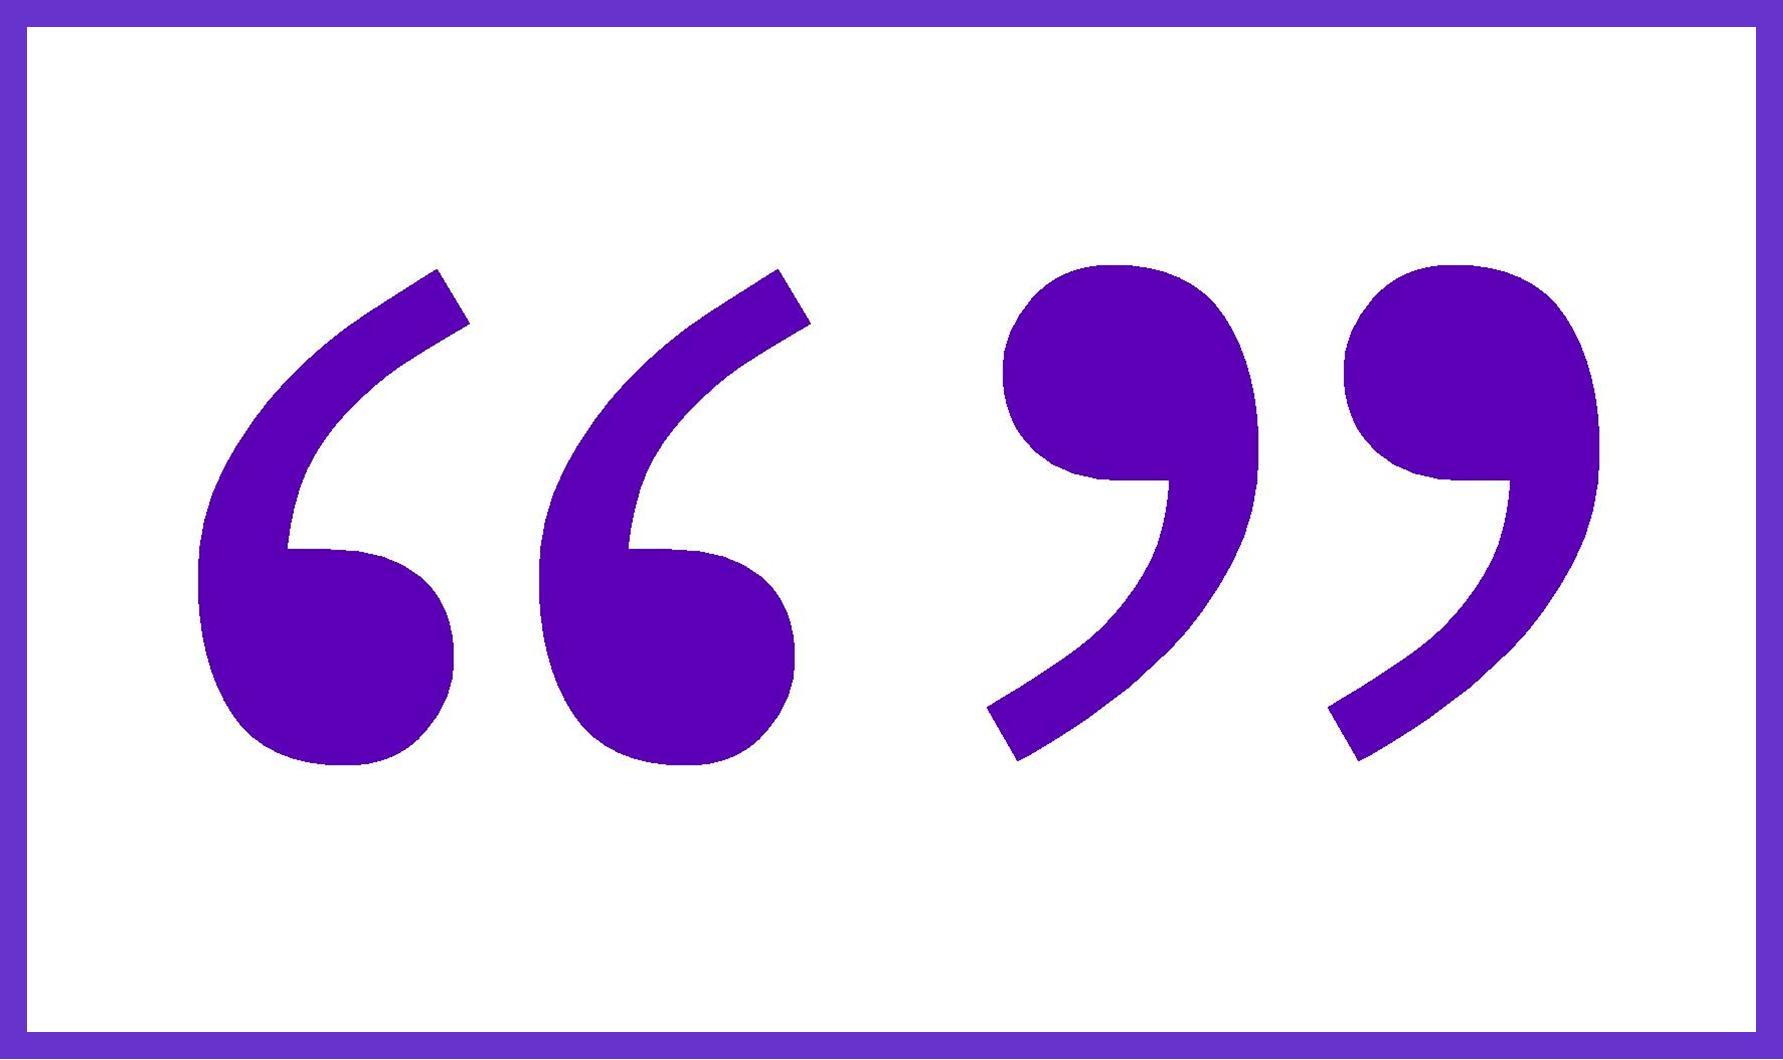 Quotation Marks Clipart Best